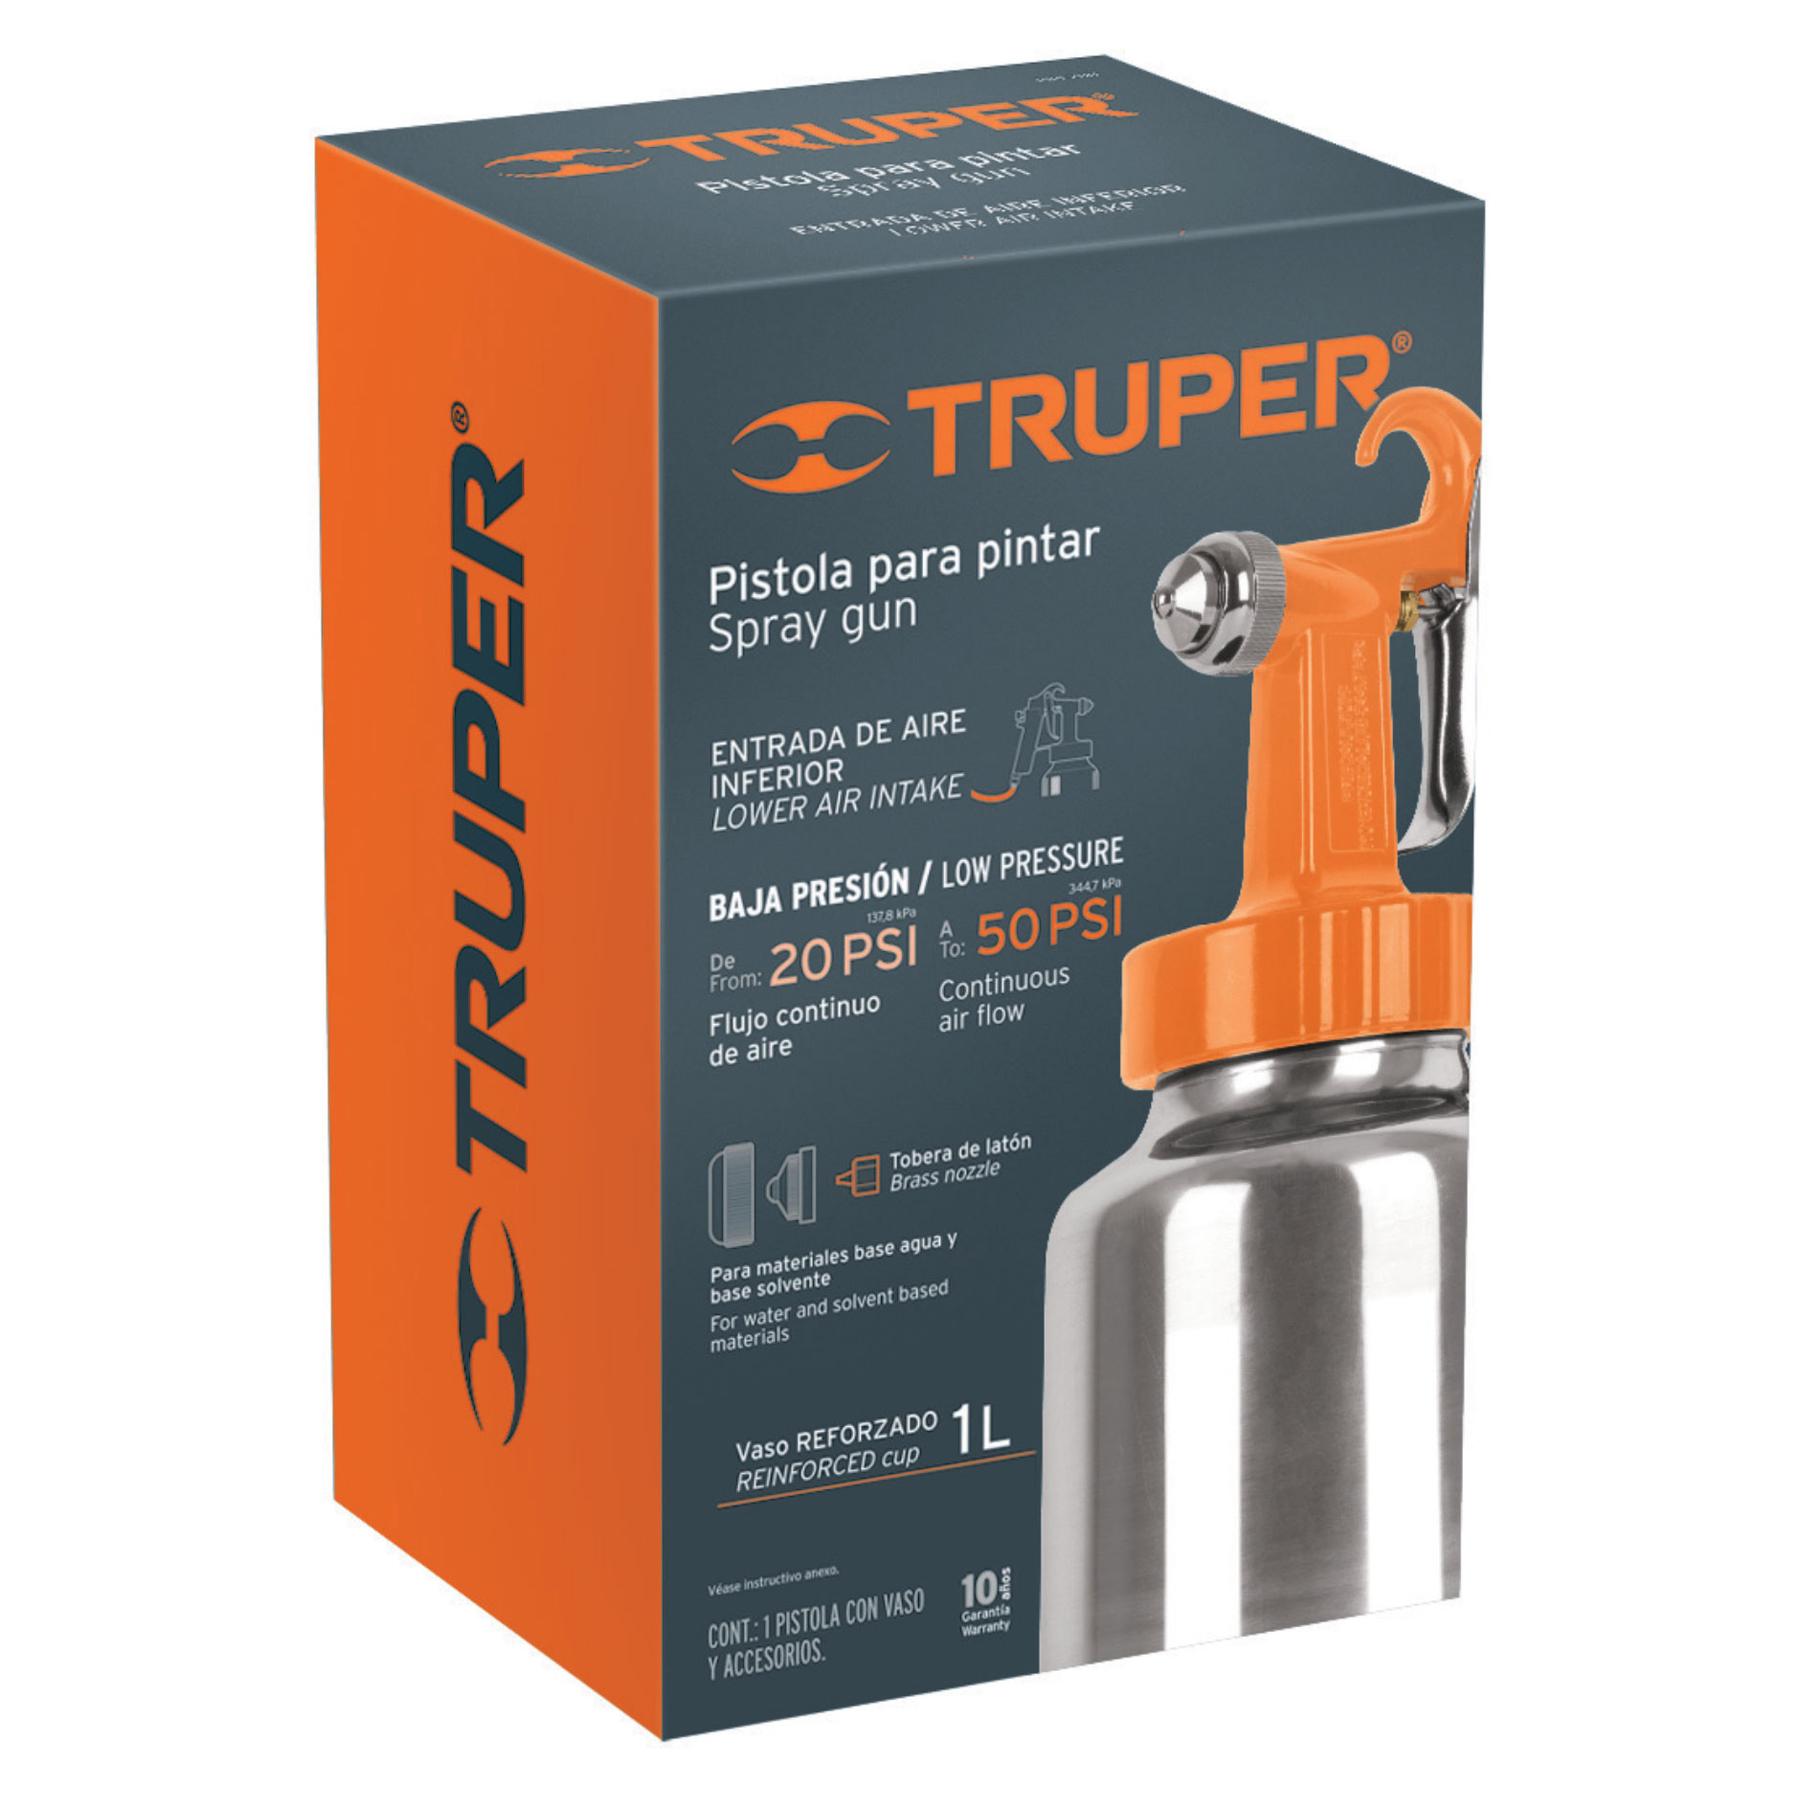 Truper - Pistola p/pintar baja presión, naranja, entrada inferior